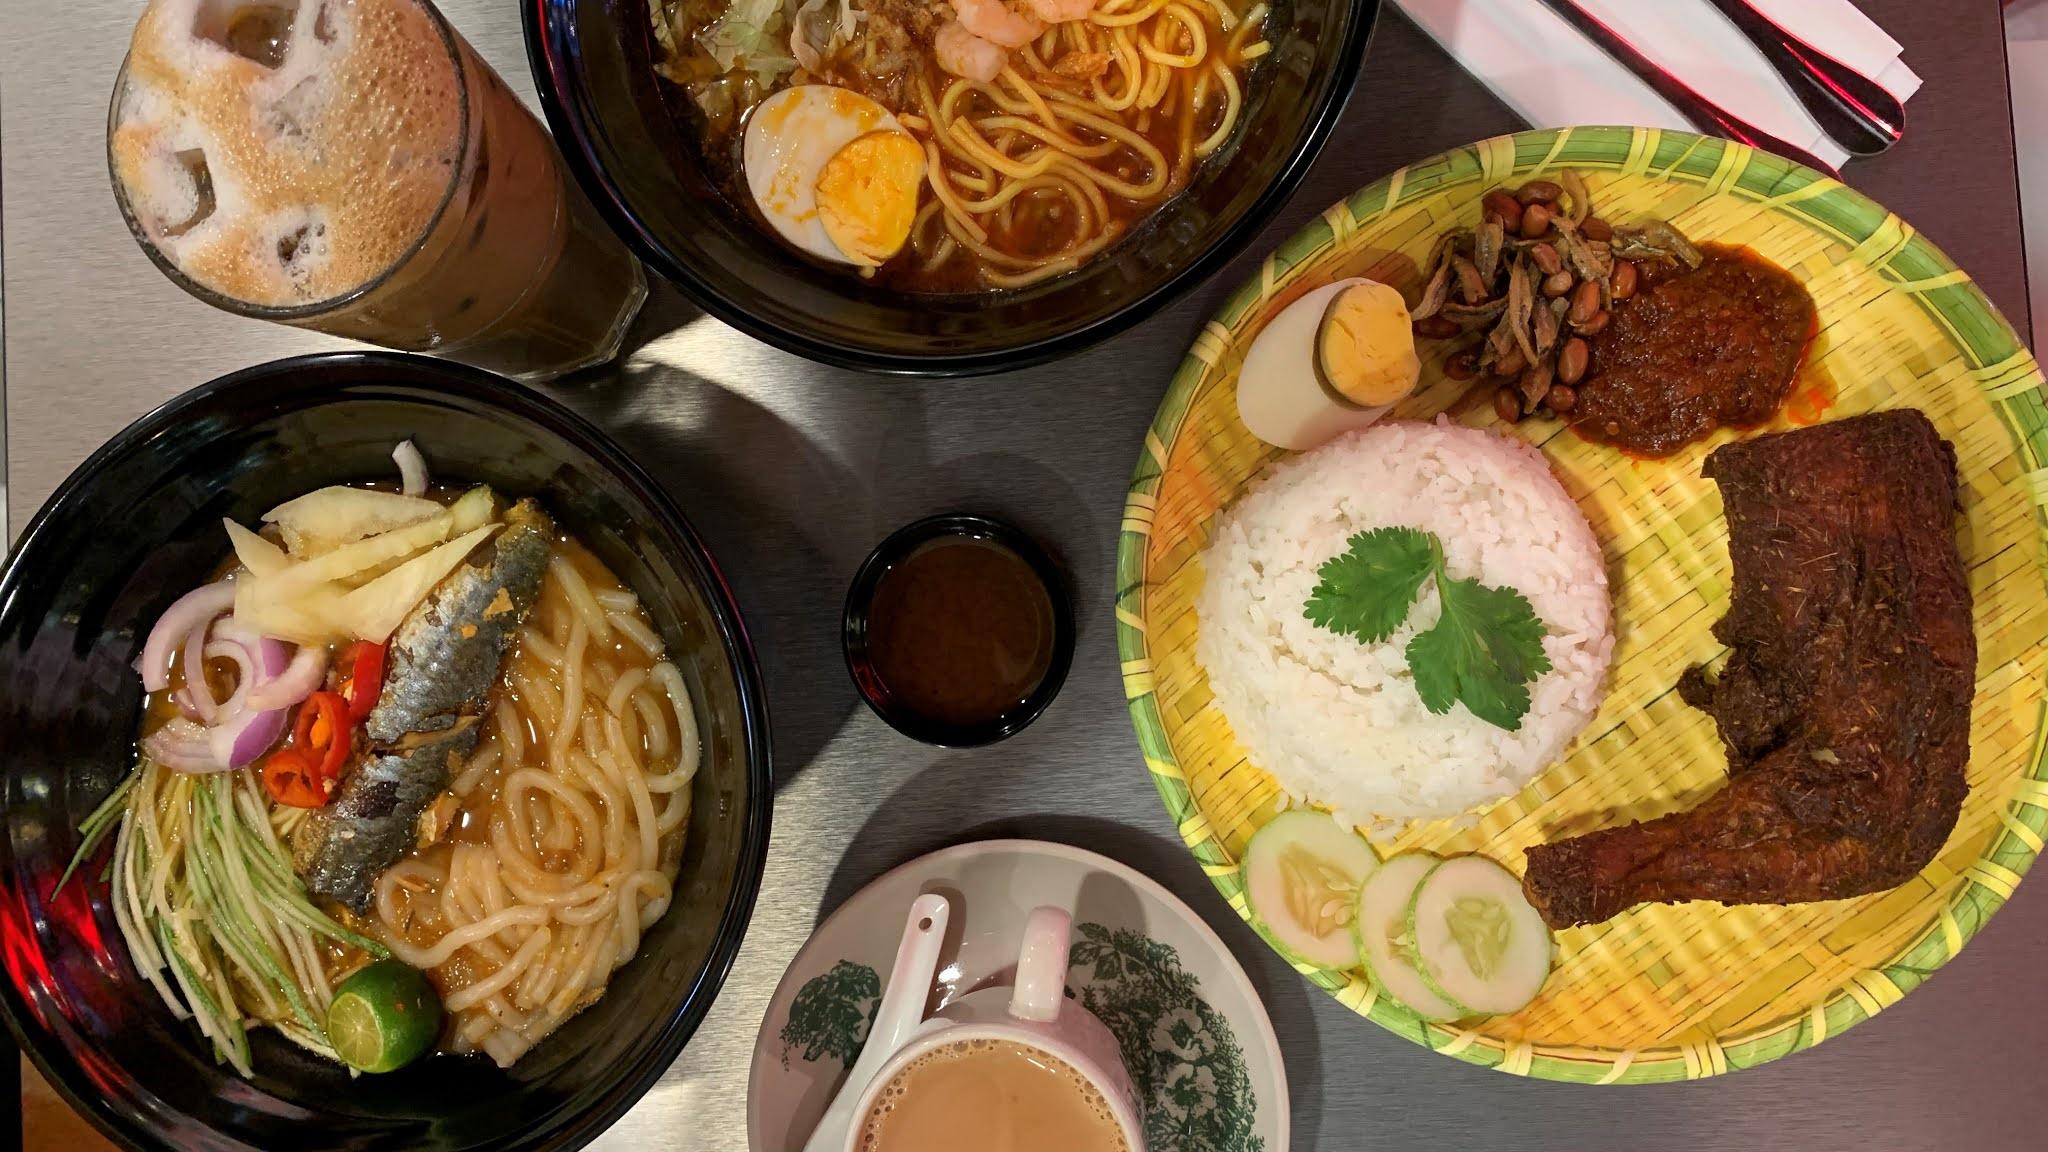 Best Place To Dinner In Kelana Jaya